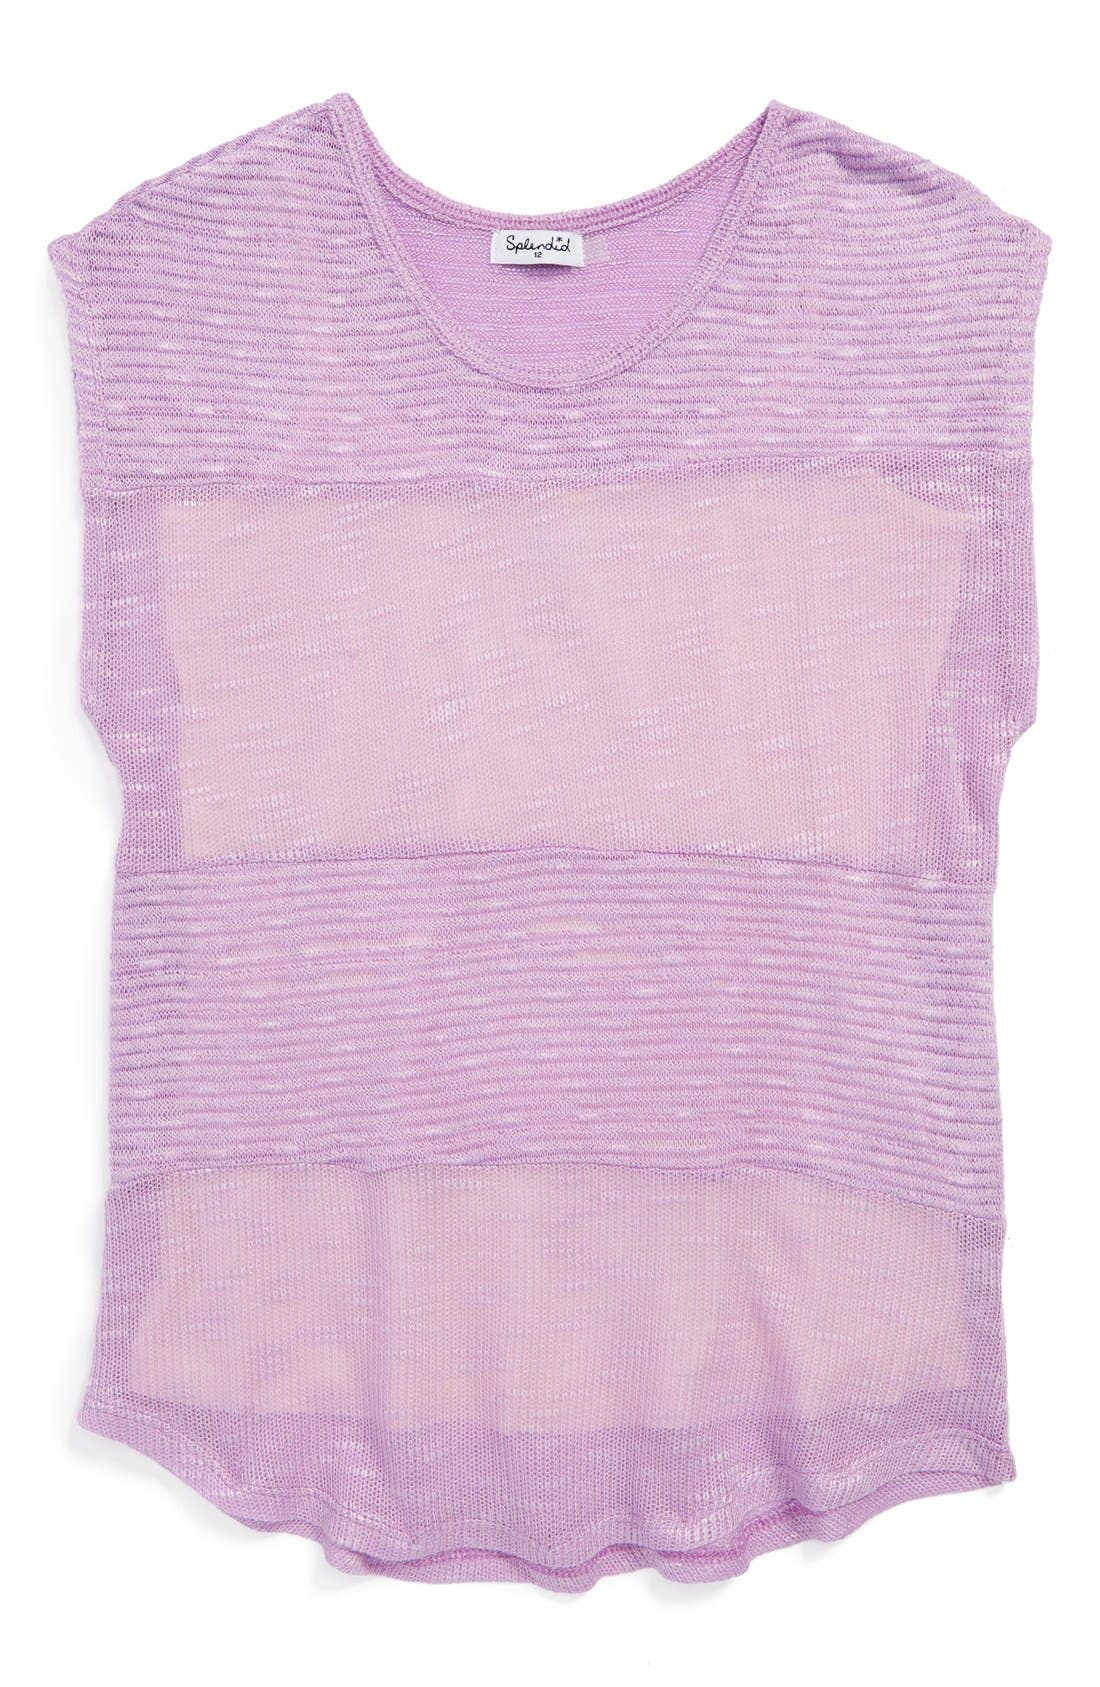 Alternate Image 1 Selected - Splendid Loose Knit Top (Big Girls)